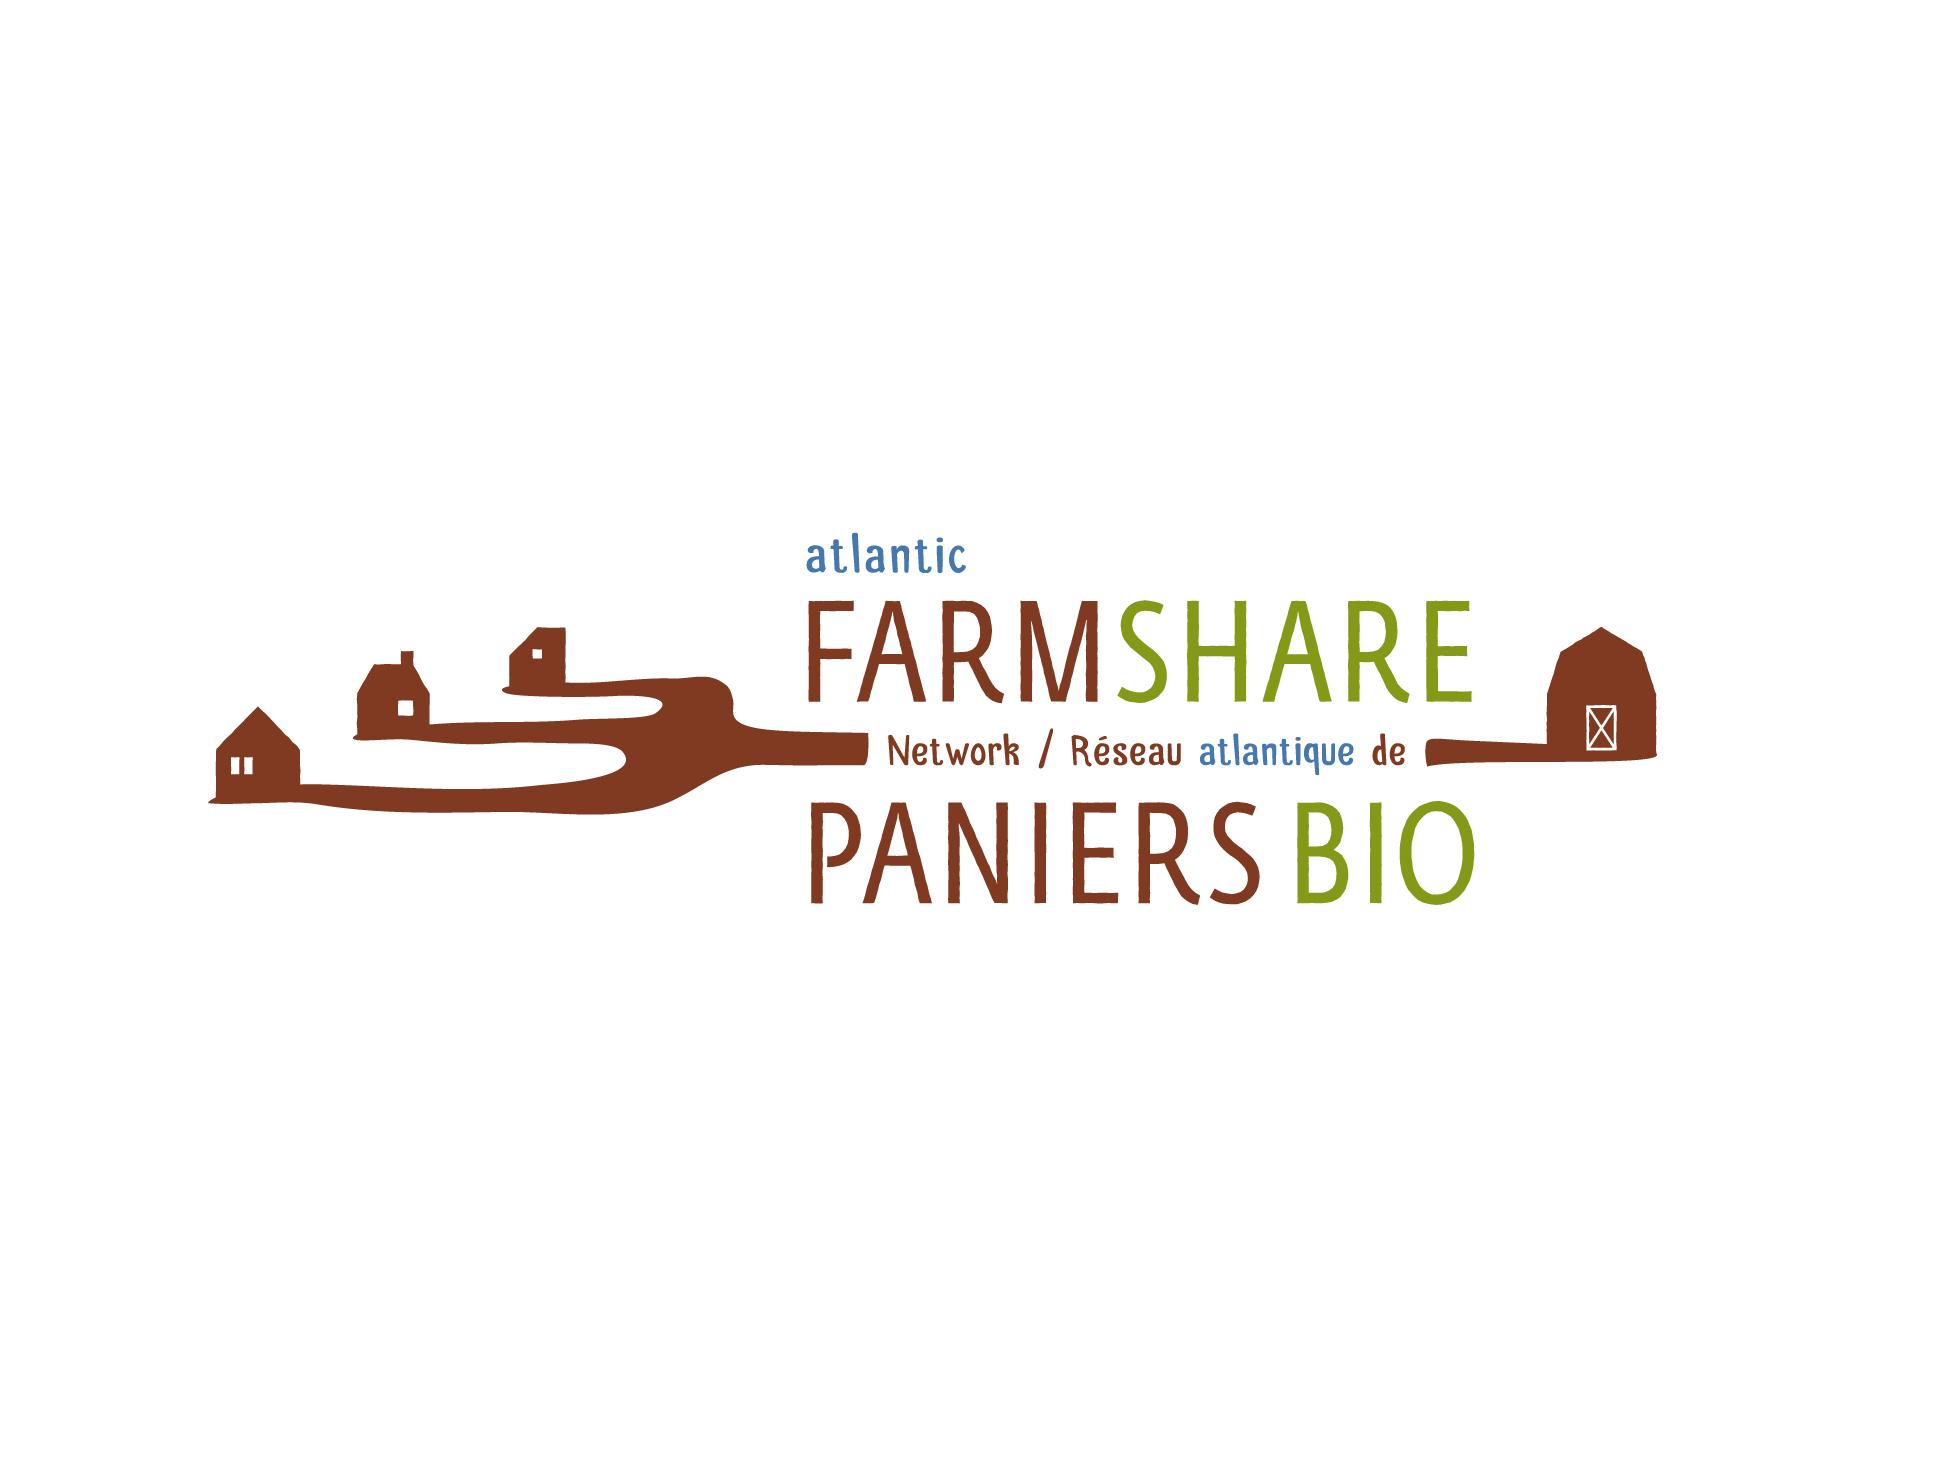 Atlantic Farmshare Network